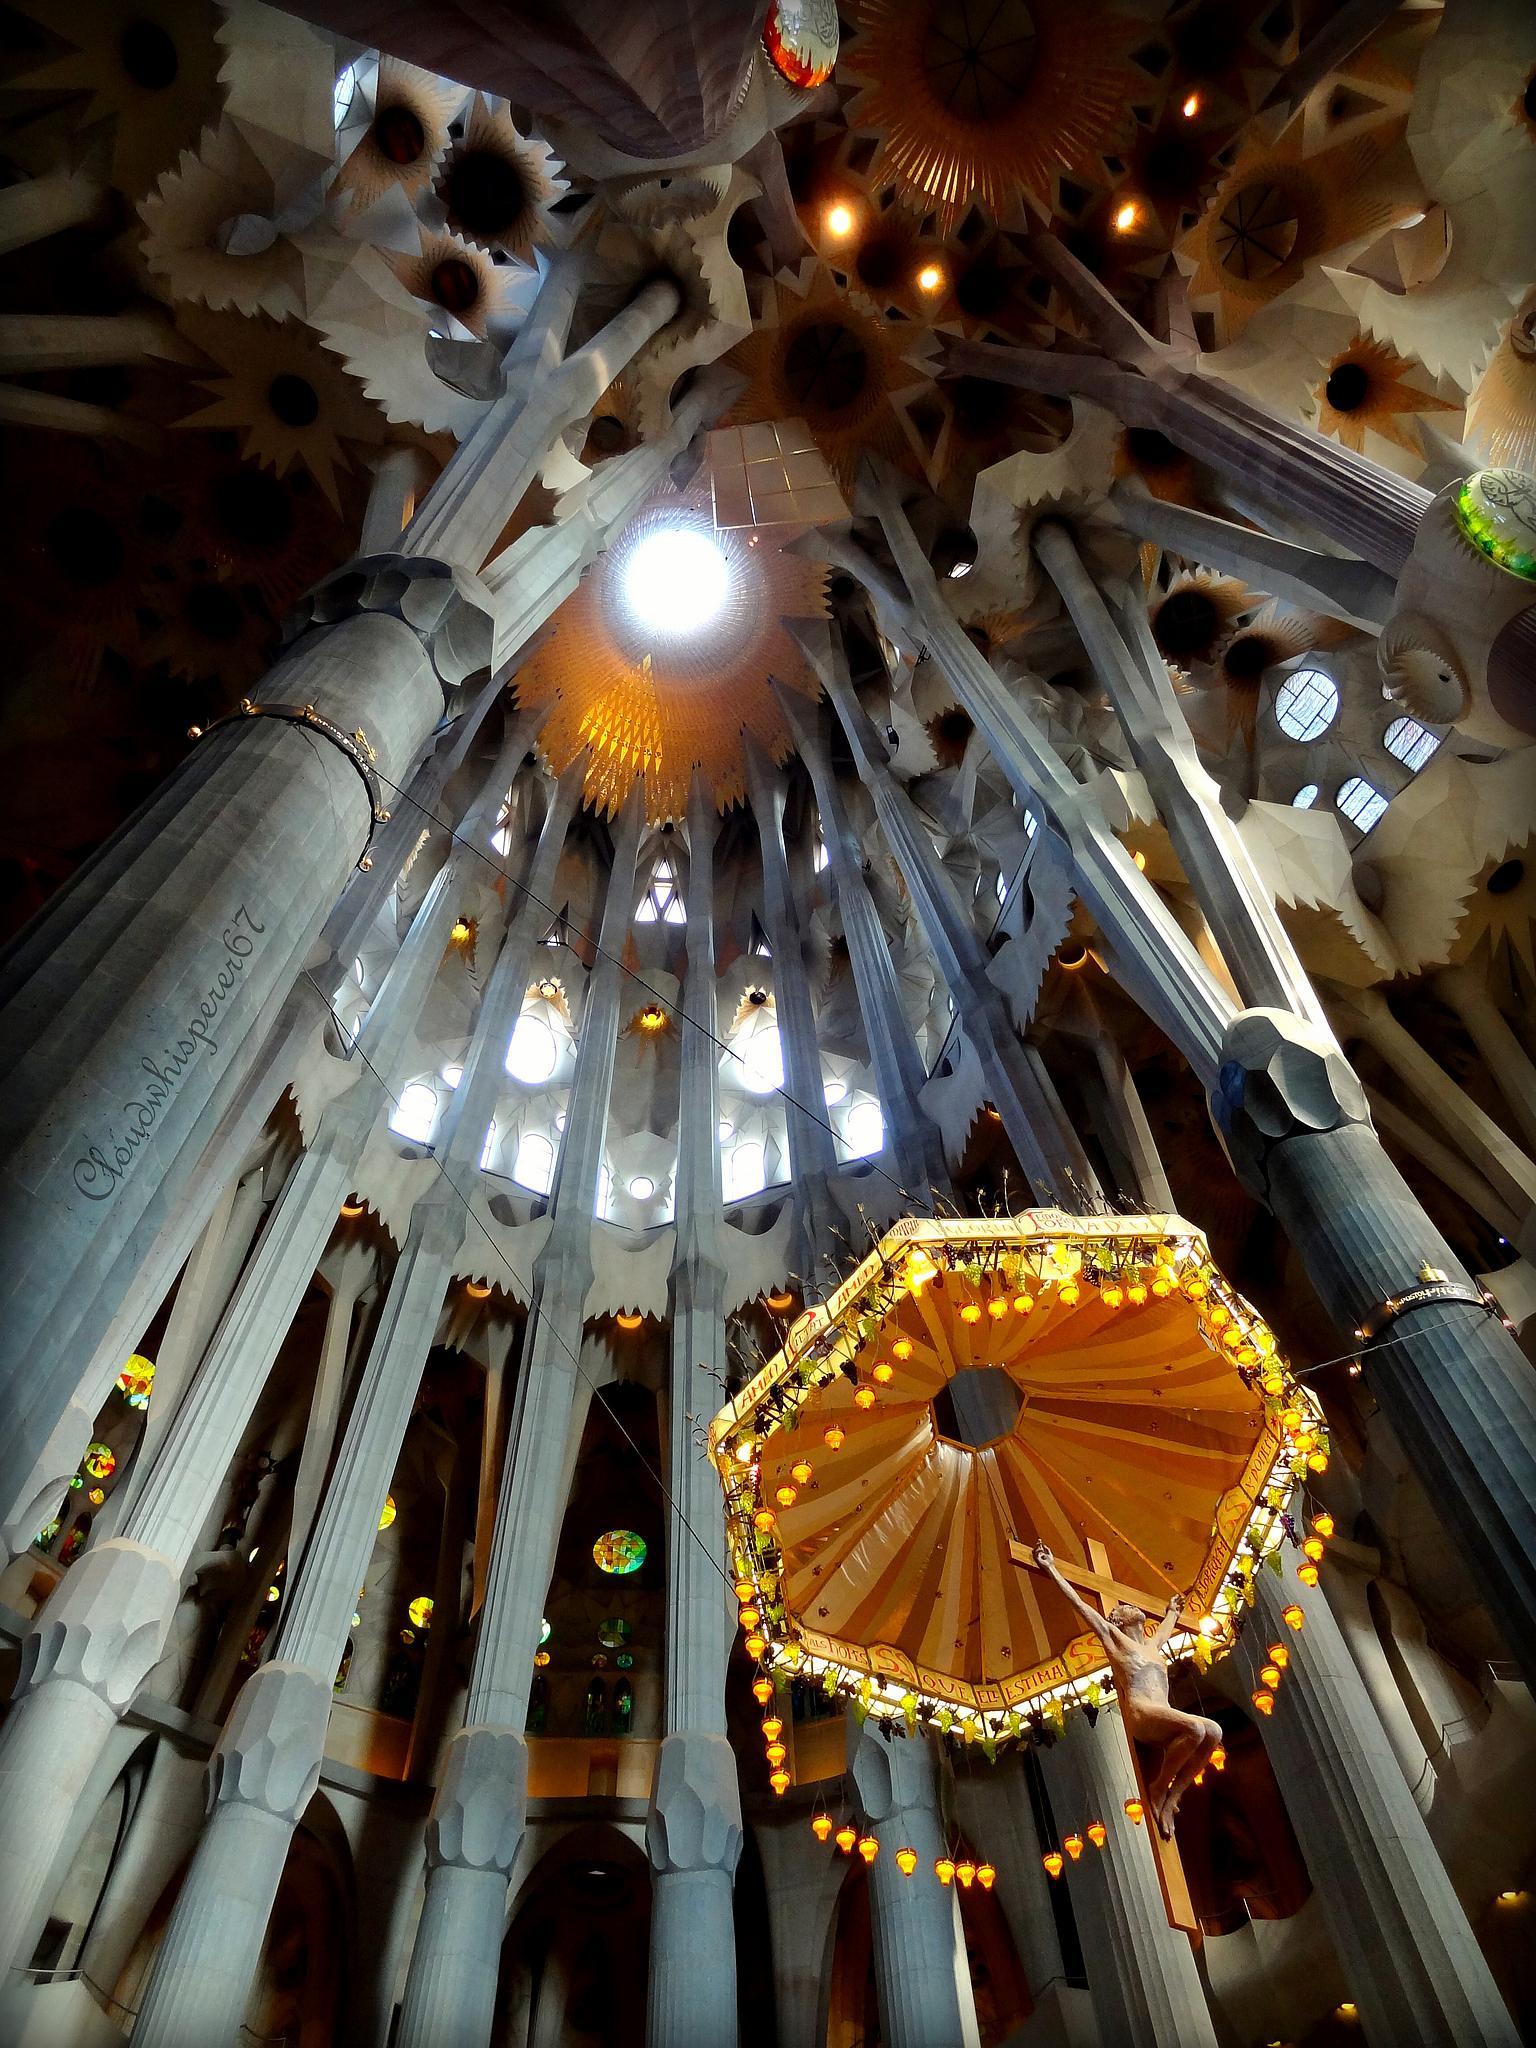 Jesus golden umbrella - Sagrada Familia, Barcelona by cloudwhisperer67